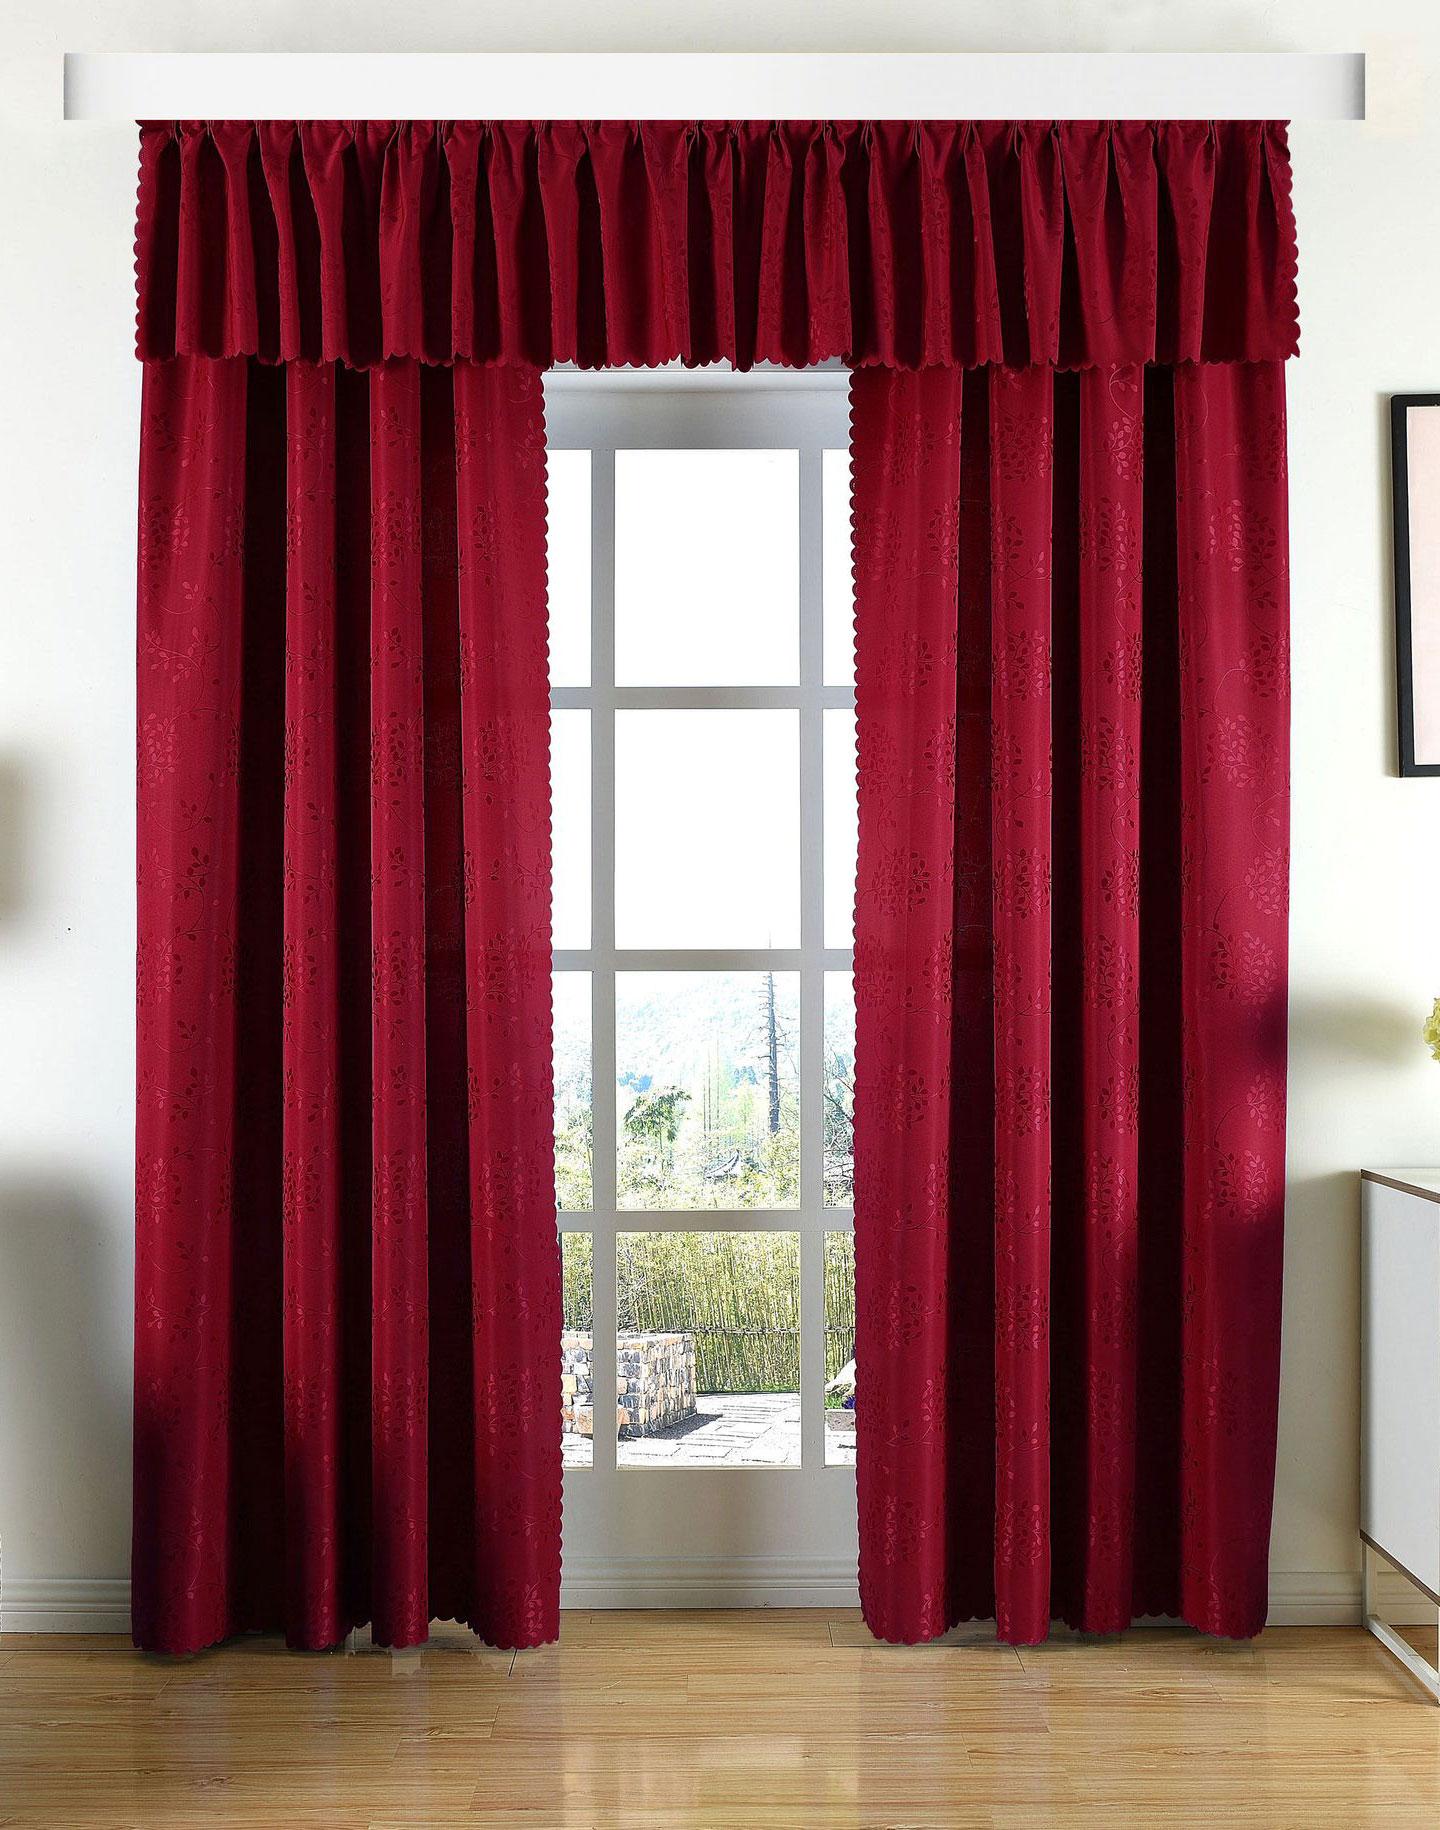 blickdicht set erset deko blickdicht fields x dessinx uni fb rotweiss with blickdicht set good. Black Bedroom Furniture Sets. Home Design Ideas